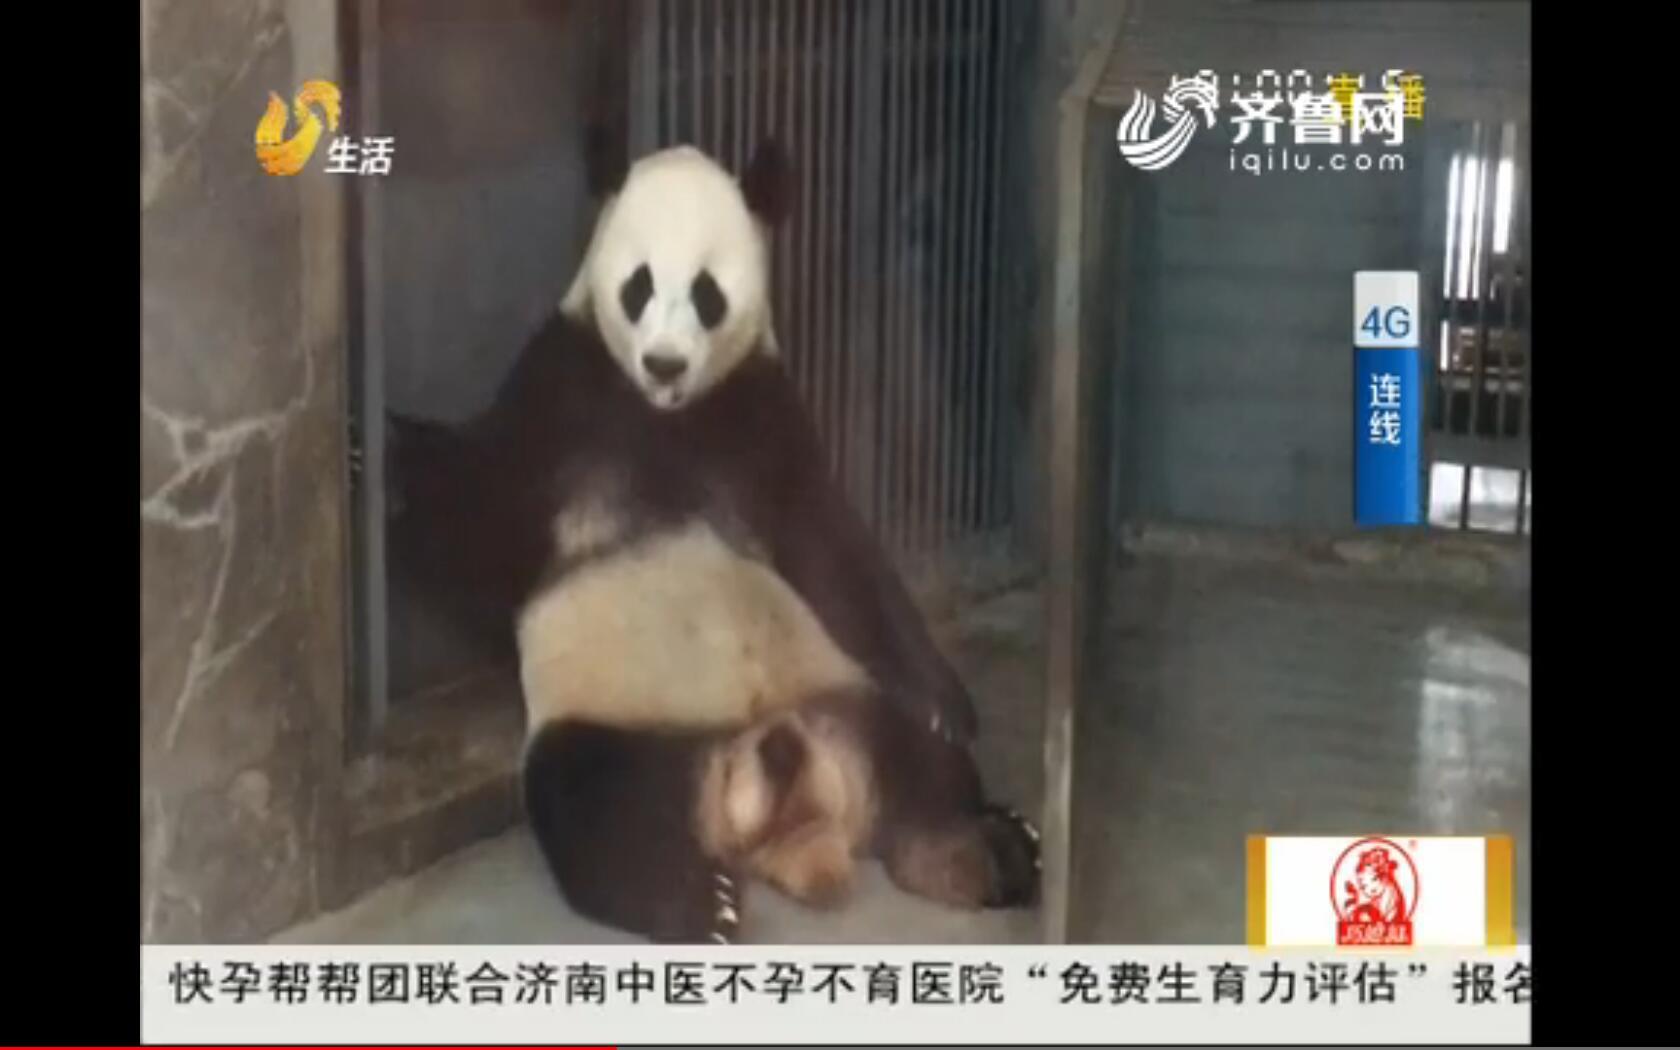 【4G连线】成都:两只大熊猫即将串笼